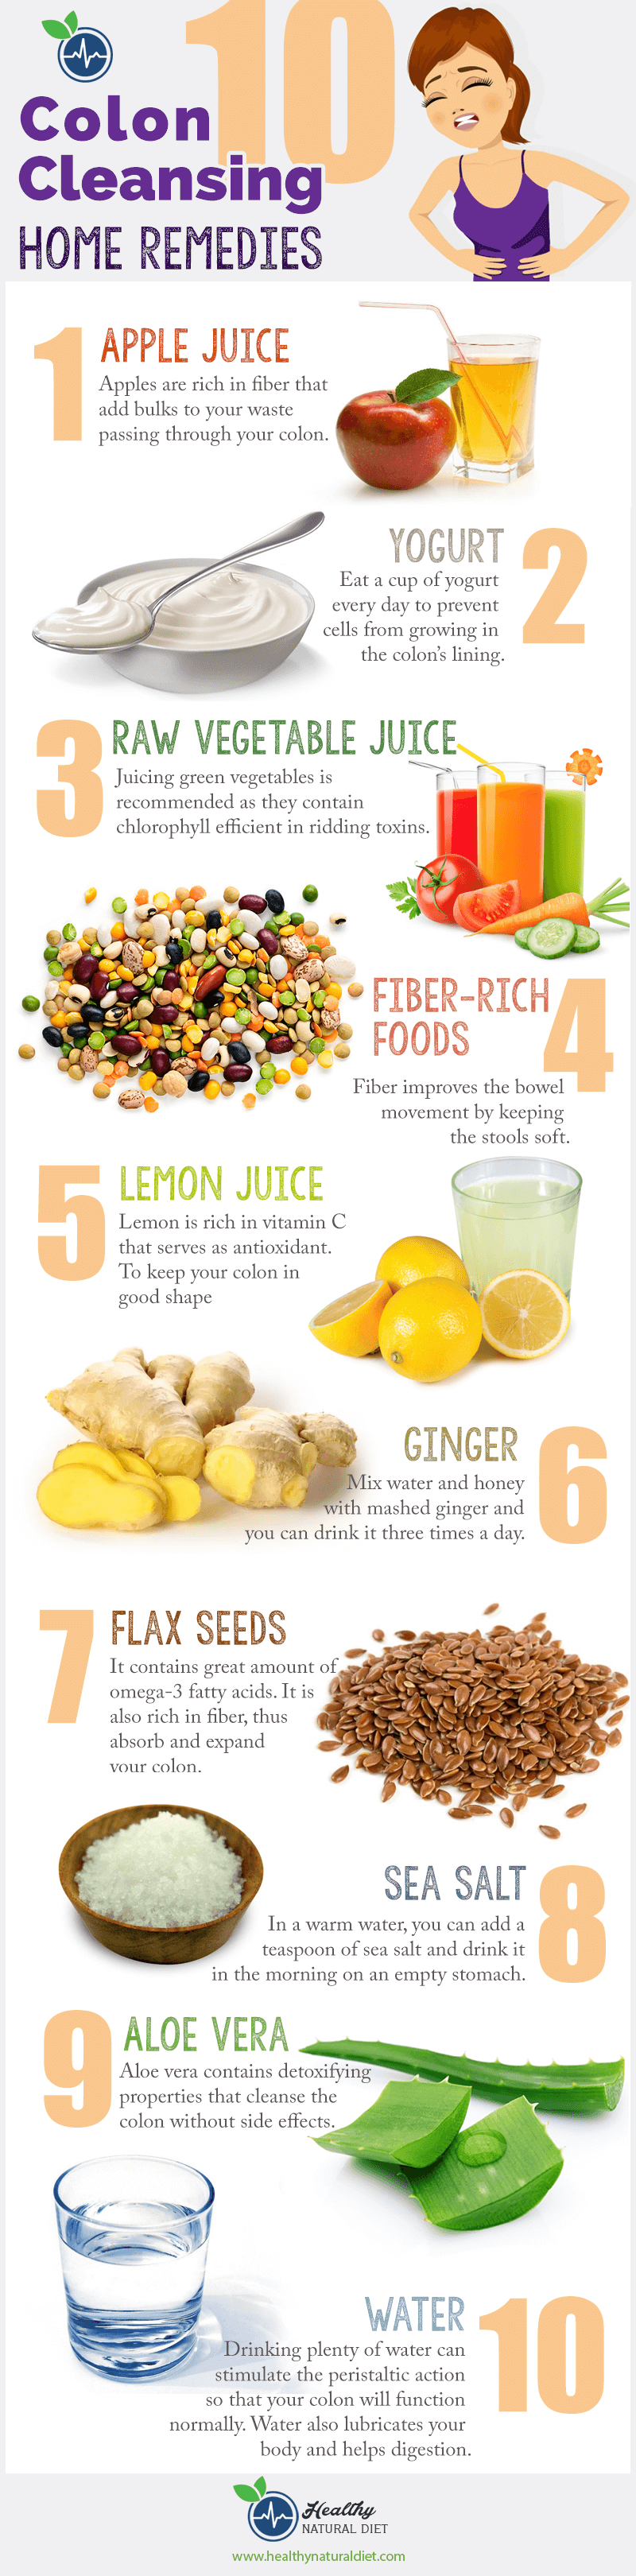 Natural colon detox cleanse recipes